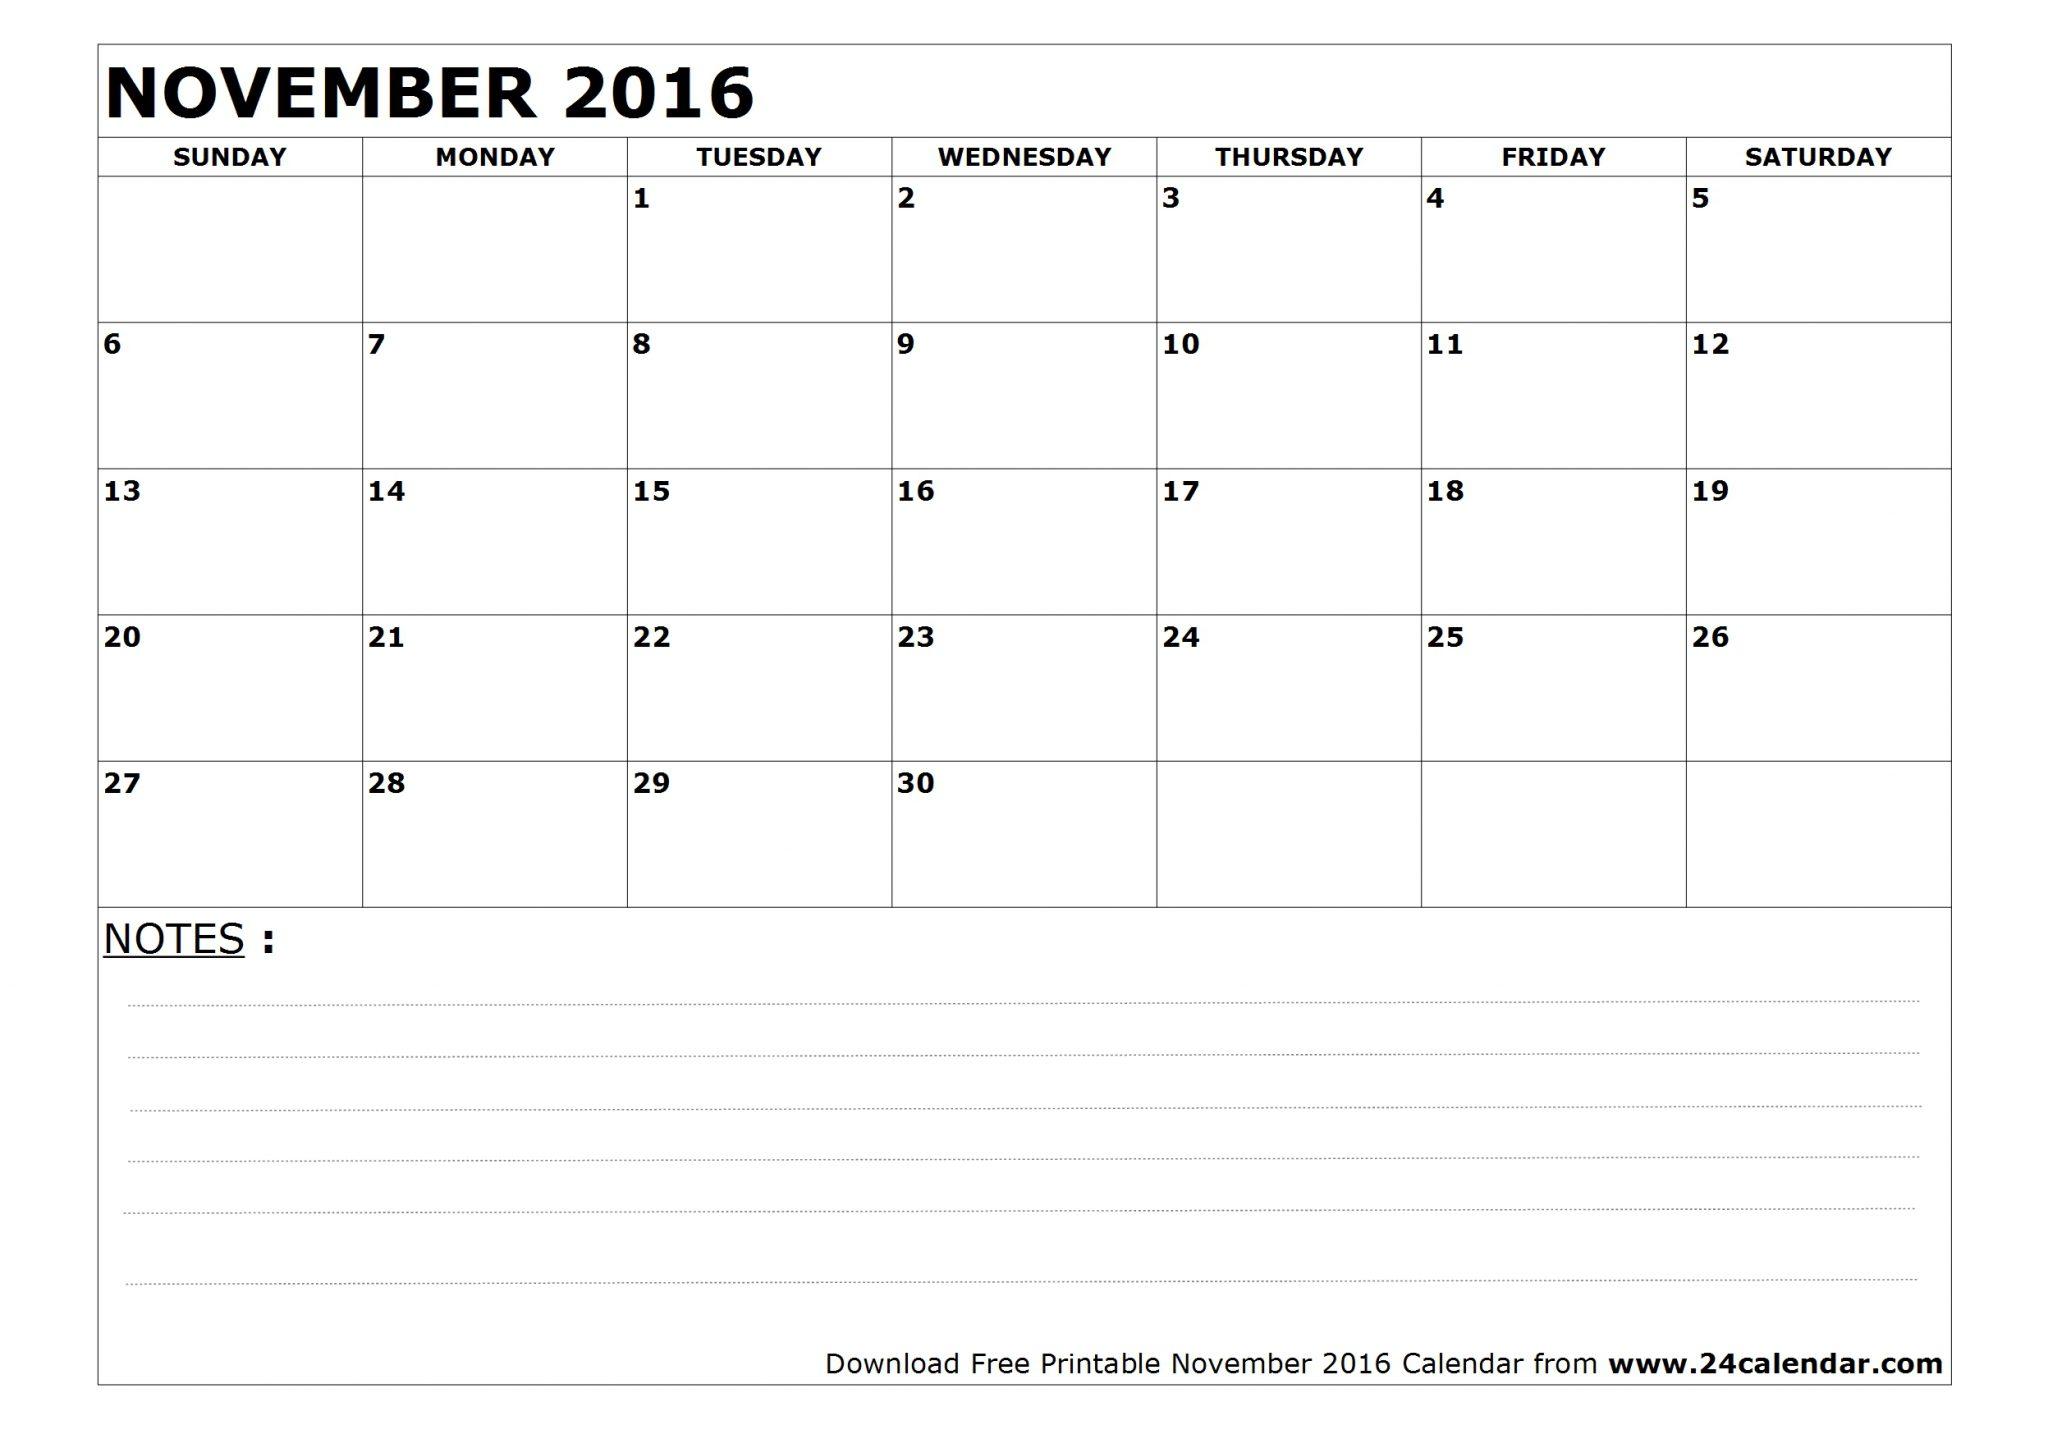 November 2016 Calendar Template